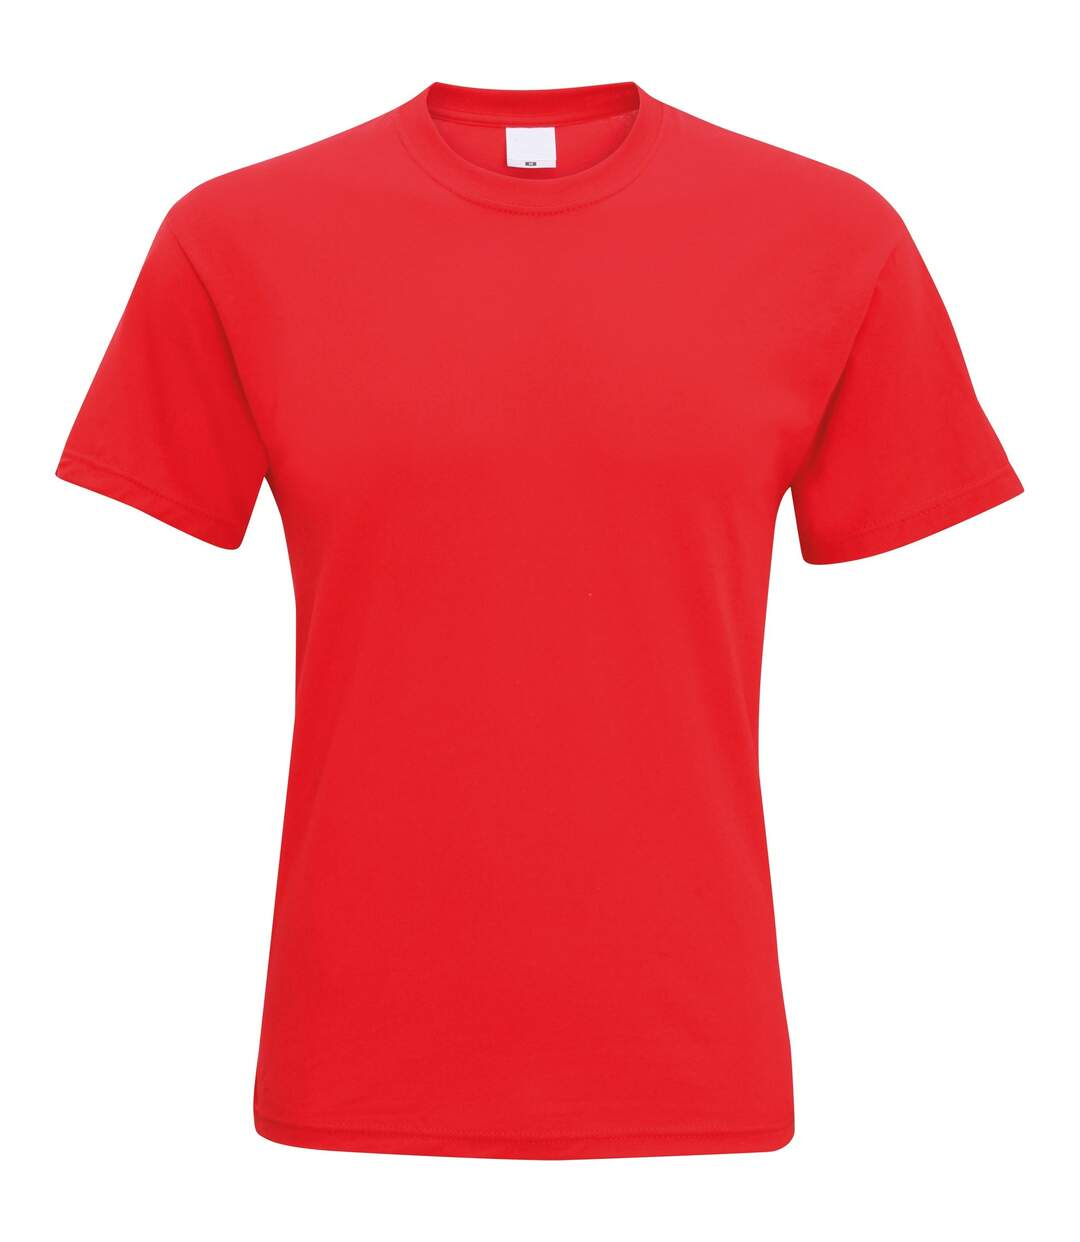 Mens Short Sleeve Casual T-Shirt (Bright Red) - UTBC3904